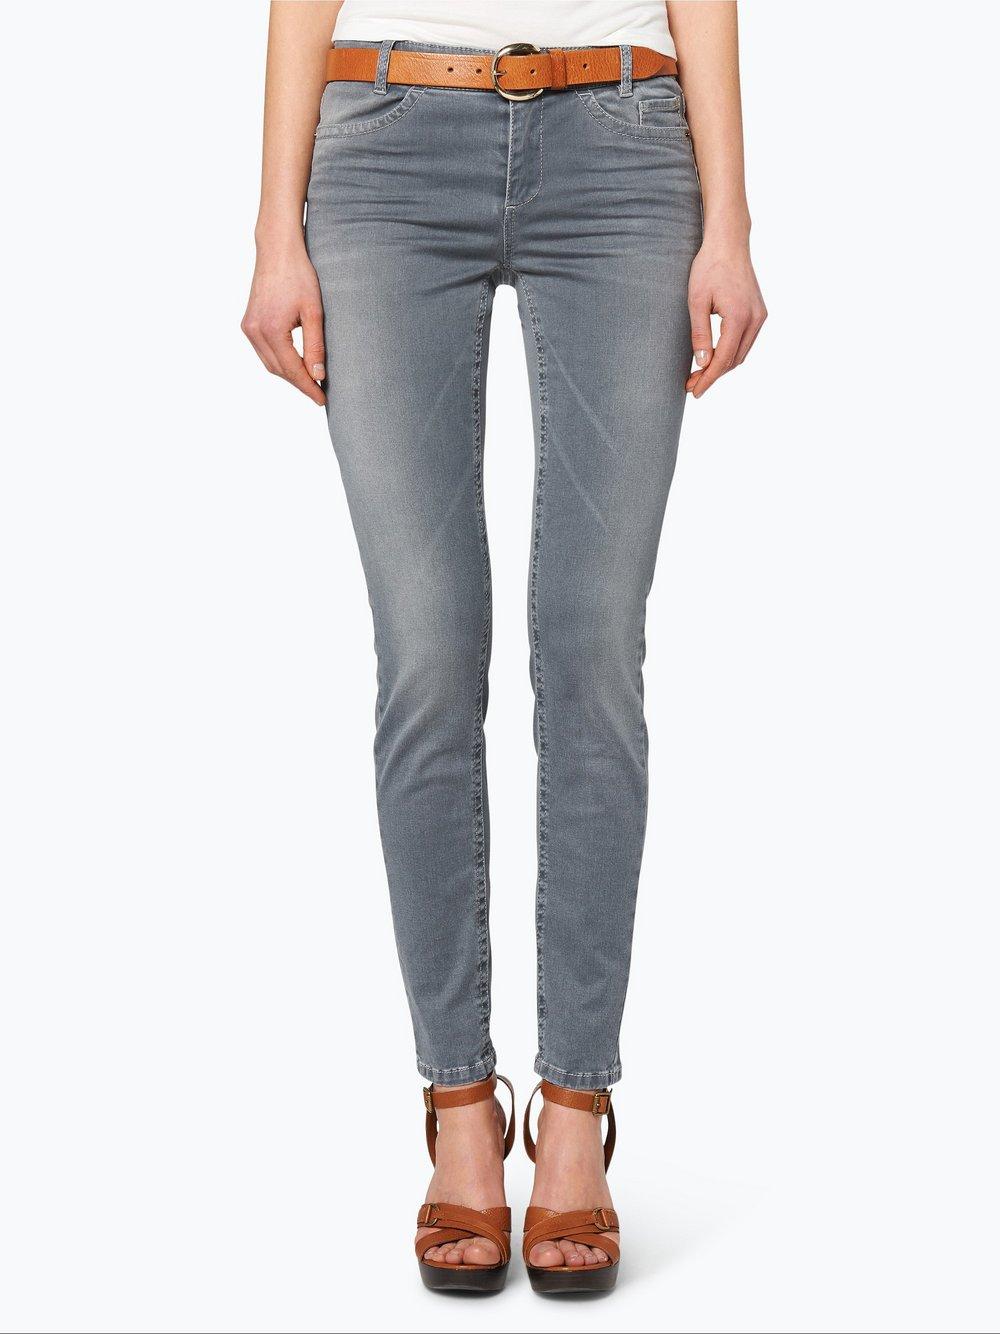 Marc Cain Essentials Damen Jeans-0